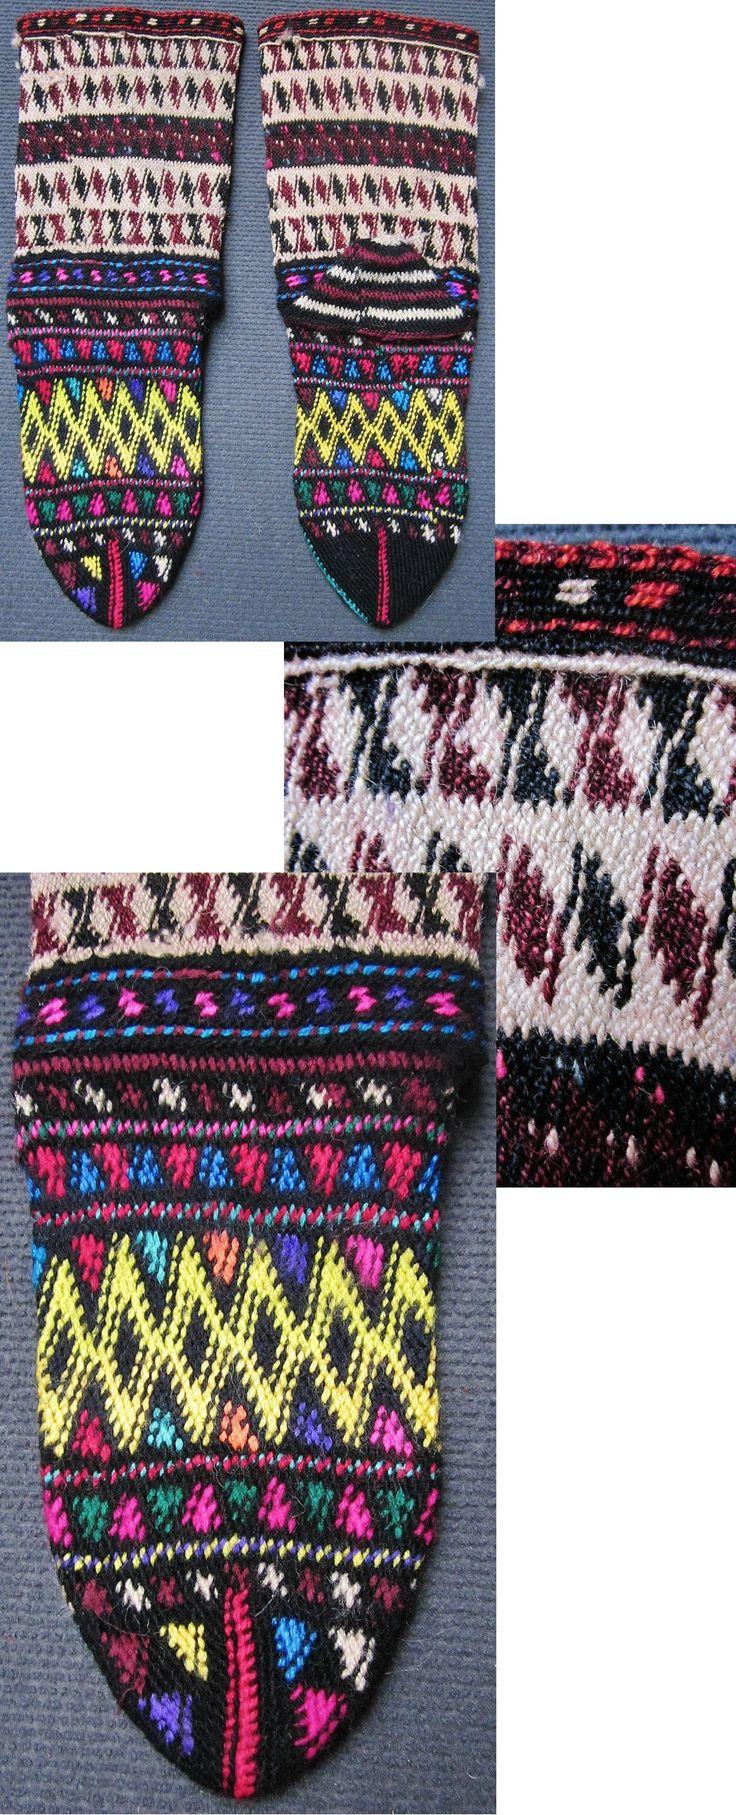 Traditional hand-knitted woollen socks, for women.  From the Keles district (South of Bursa).  Late 20th century.  Ethnic goup: Yörük (Karakeçeli).  (Inv.nr. çor035- Kavak Costume Collection - Antwerpen/Belgium).